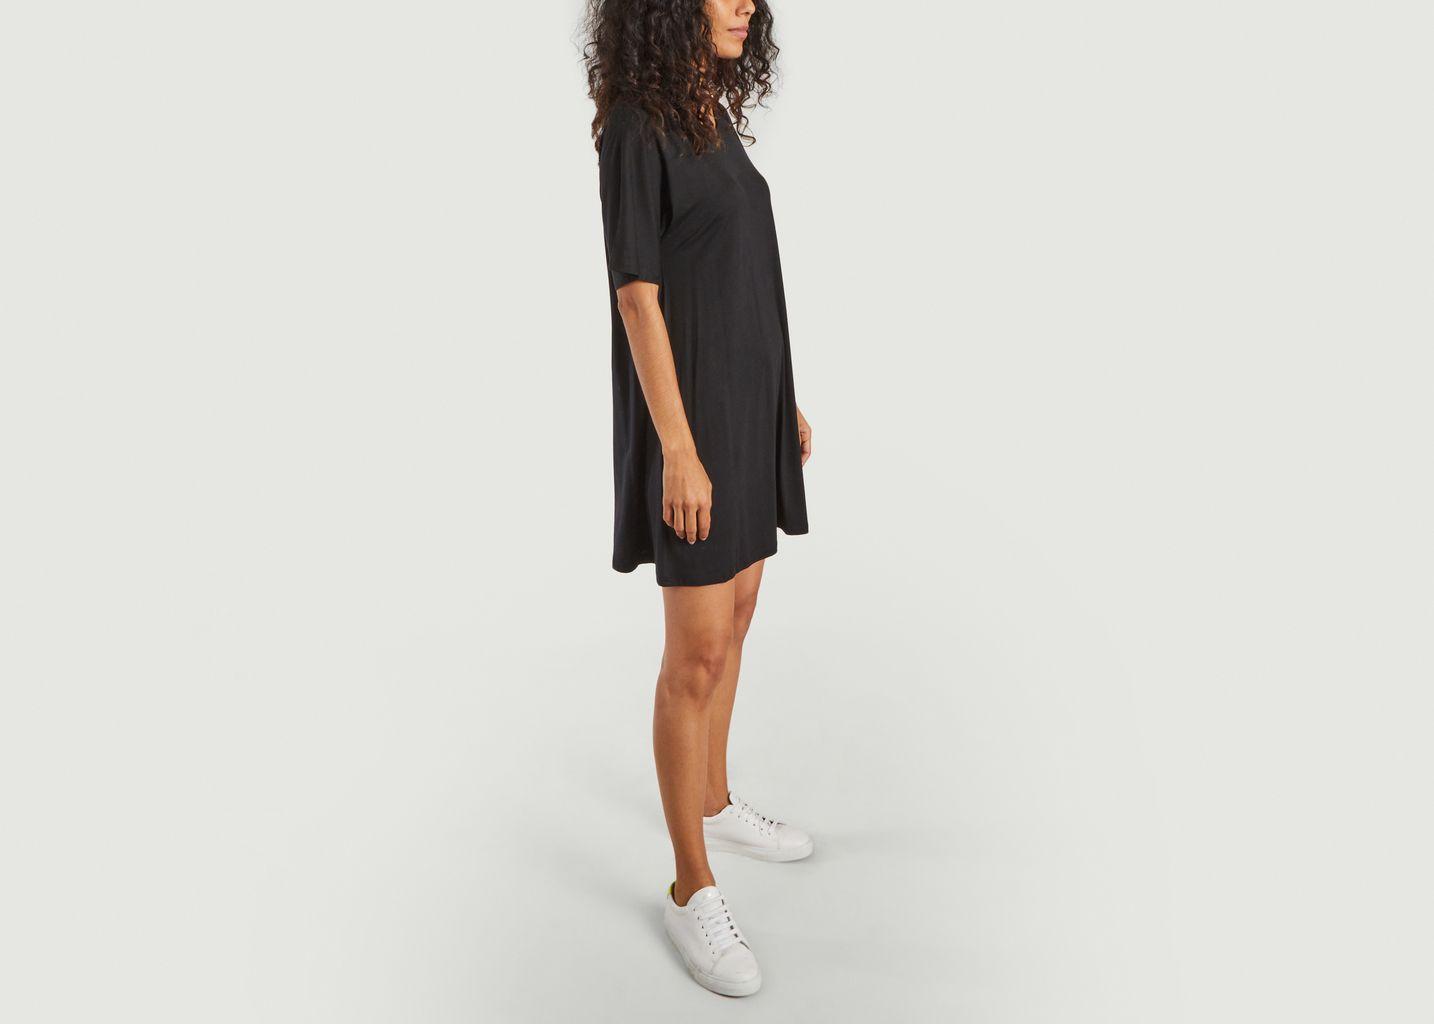 Robe t-shirt noire légère en tencel - Organic Basics